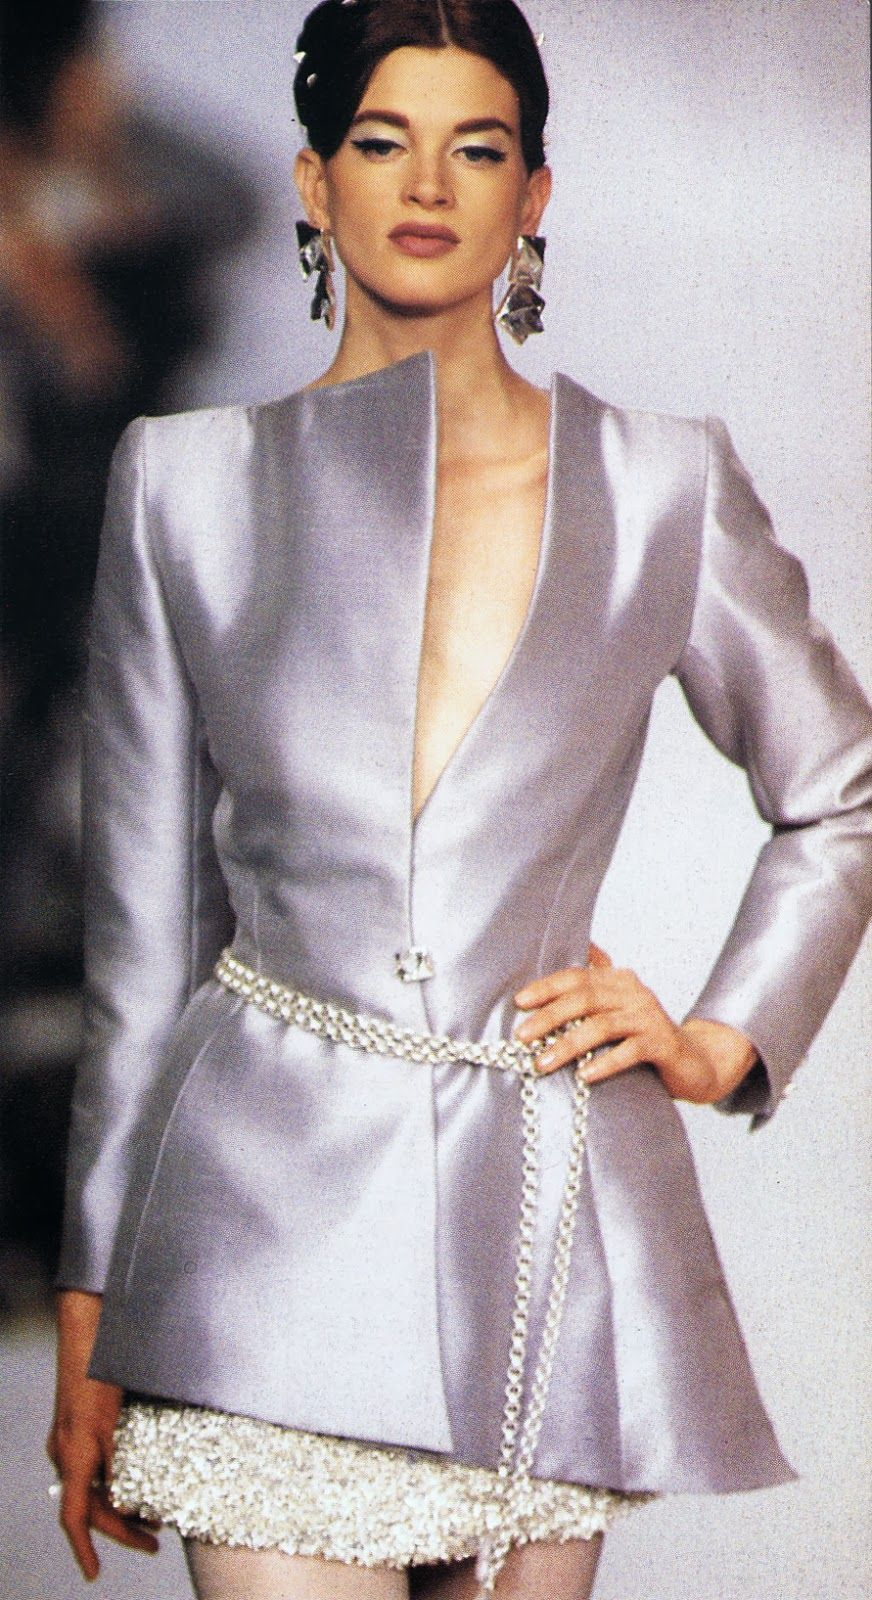 KRISTEN MCMENAMY Lanvin Show S/S 1991